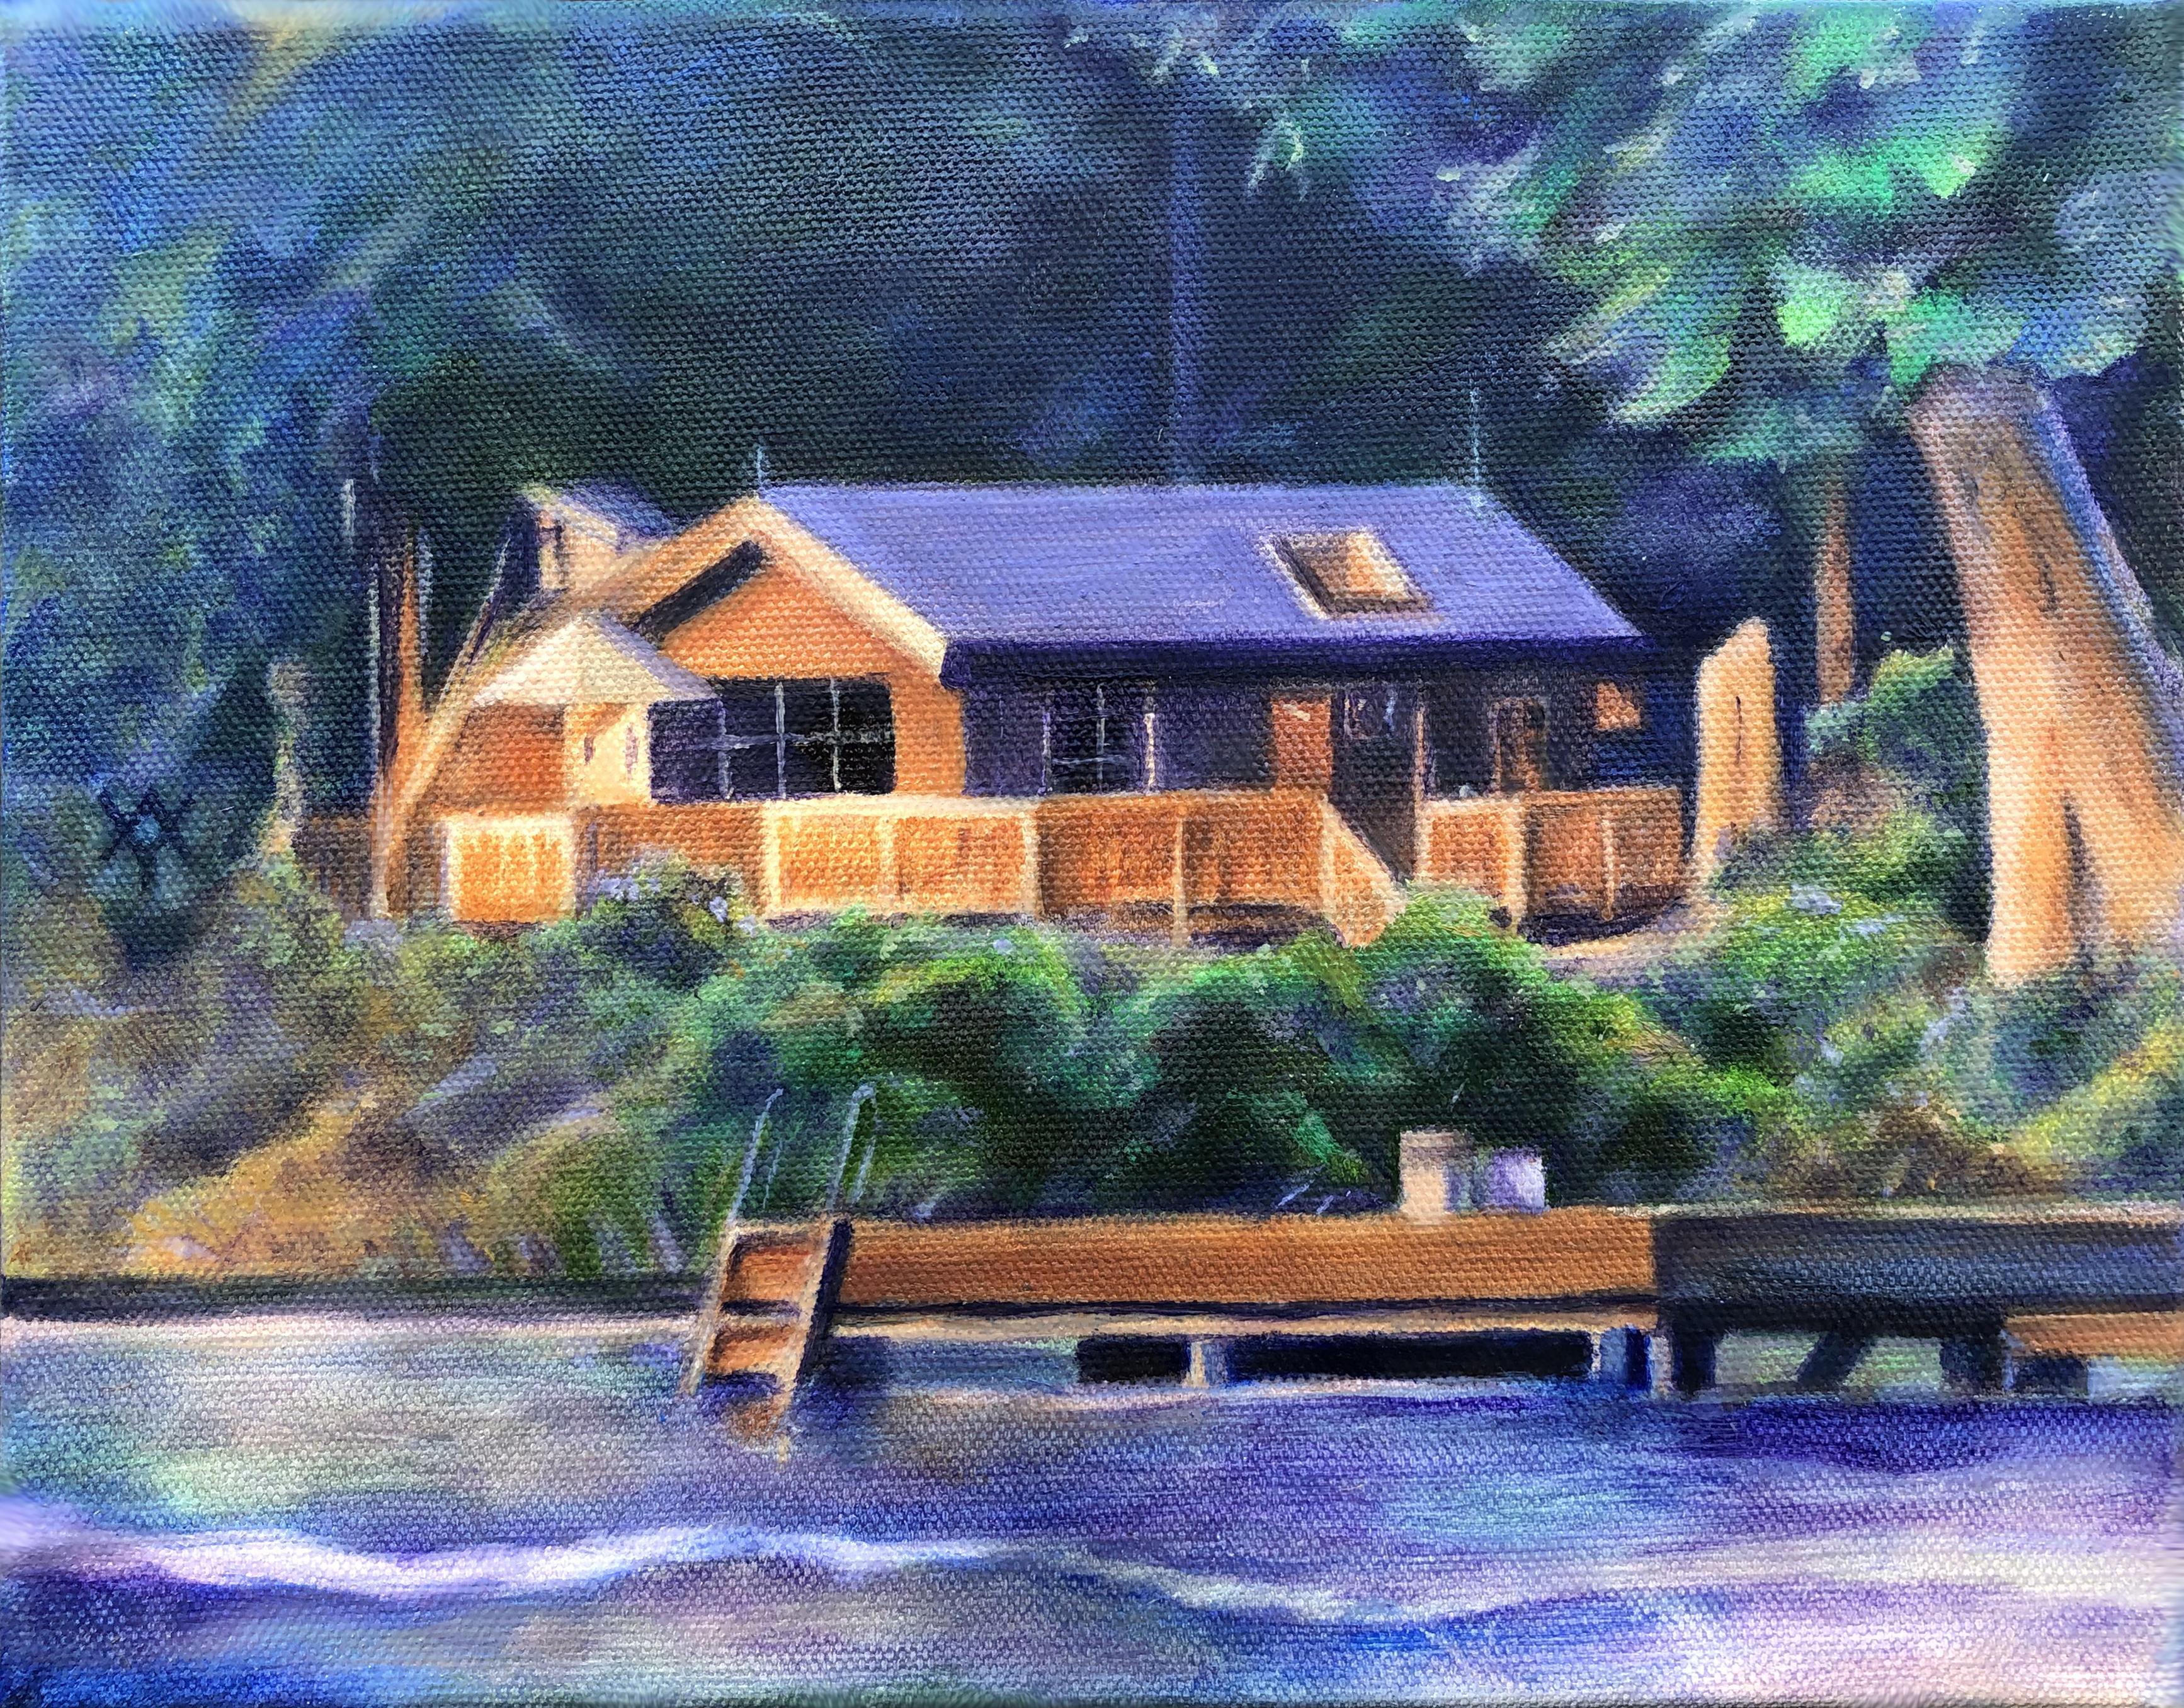 Snohomish Cabin